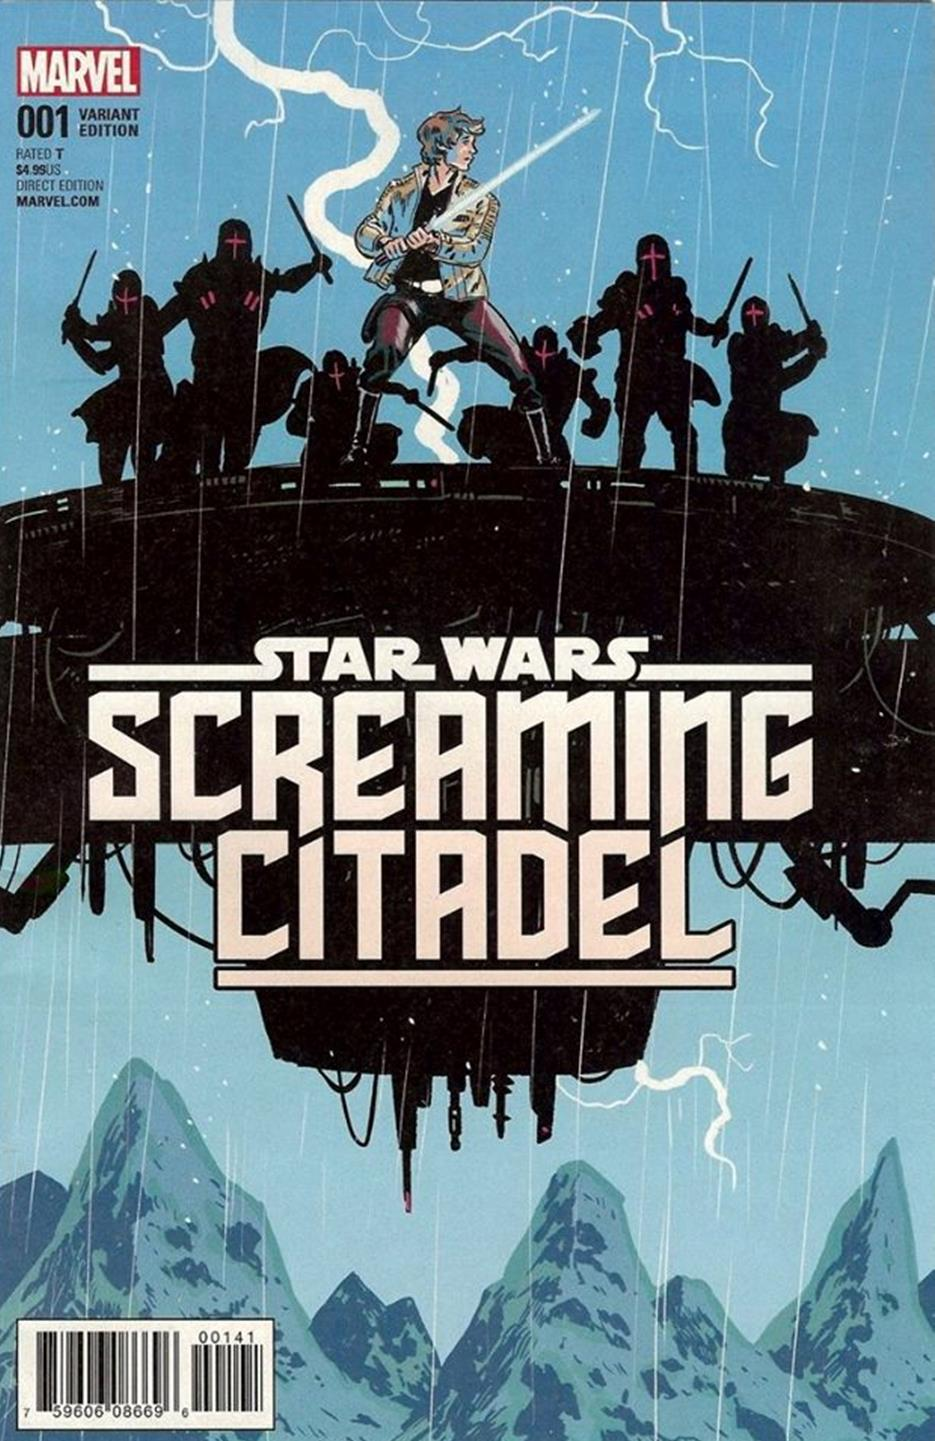 Star Wars: Screaming Citadel - Michael Walsh Variant